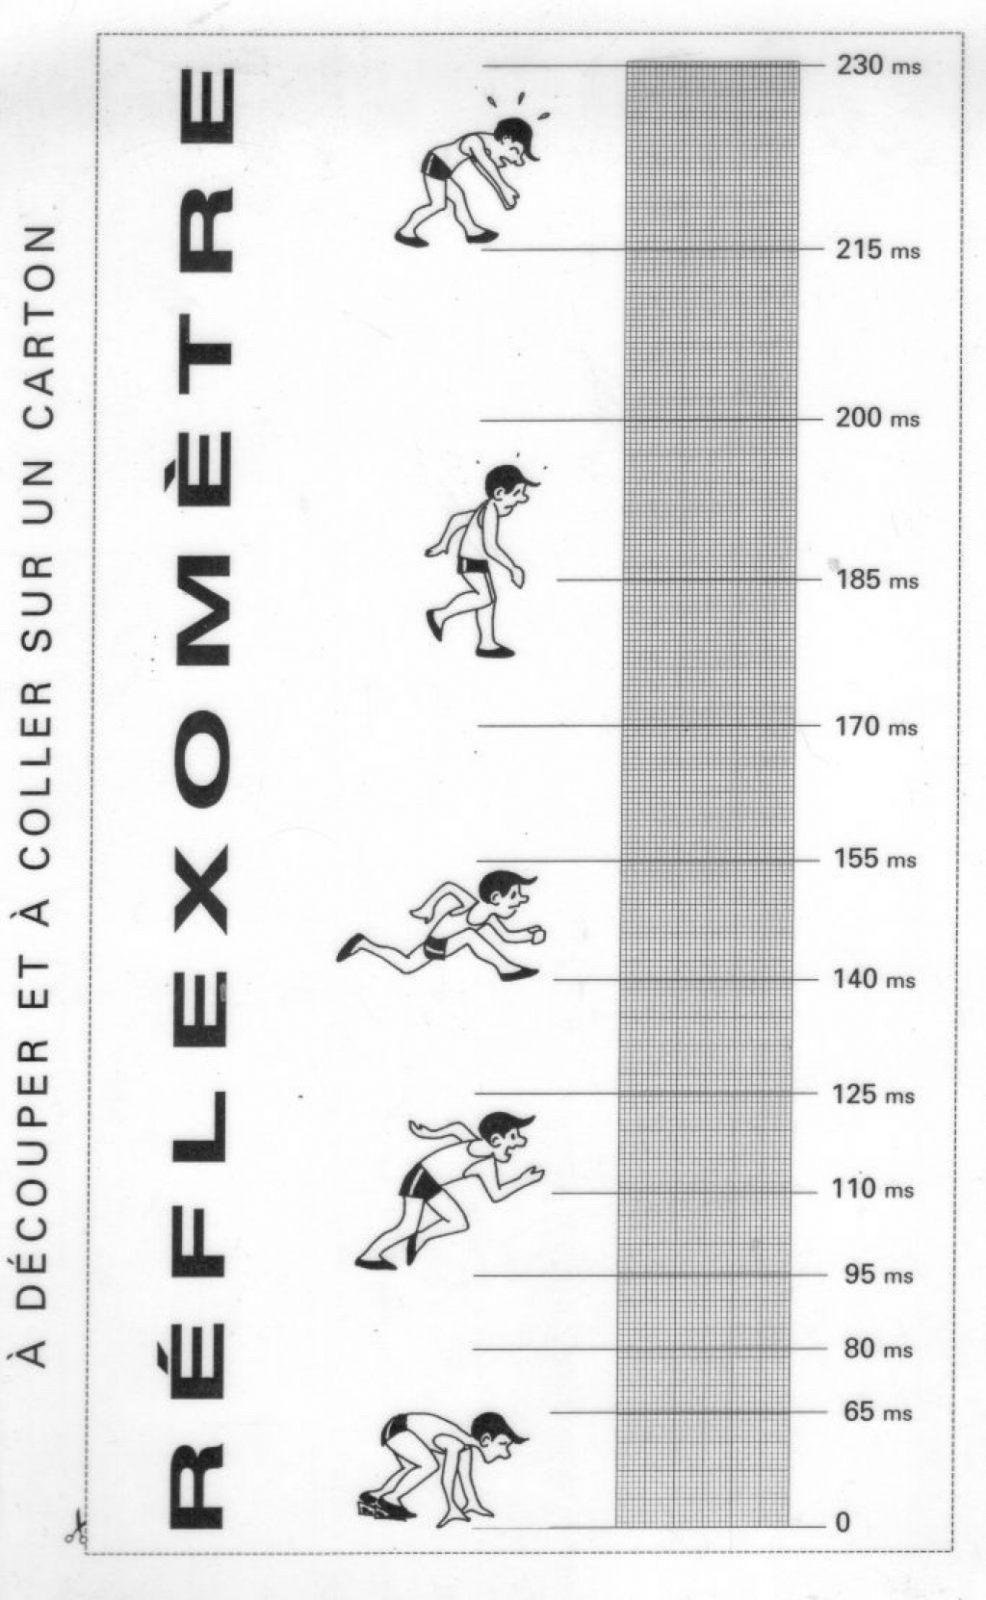 reflexometre